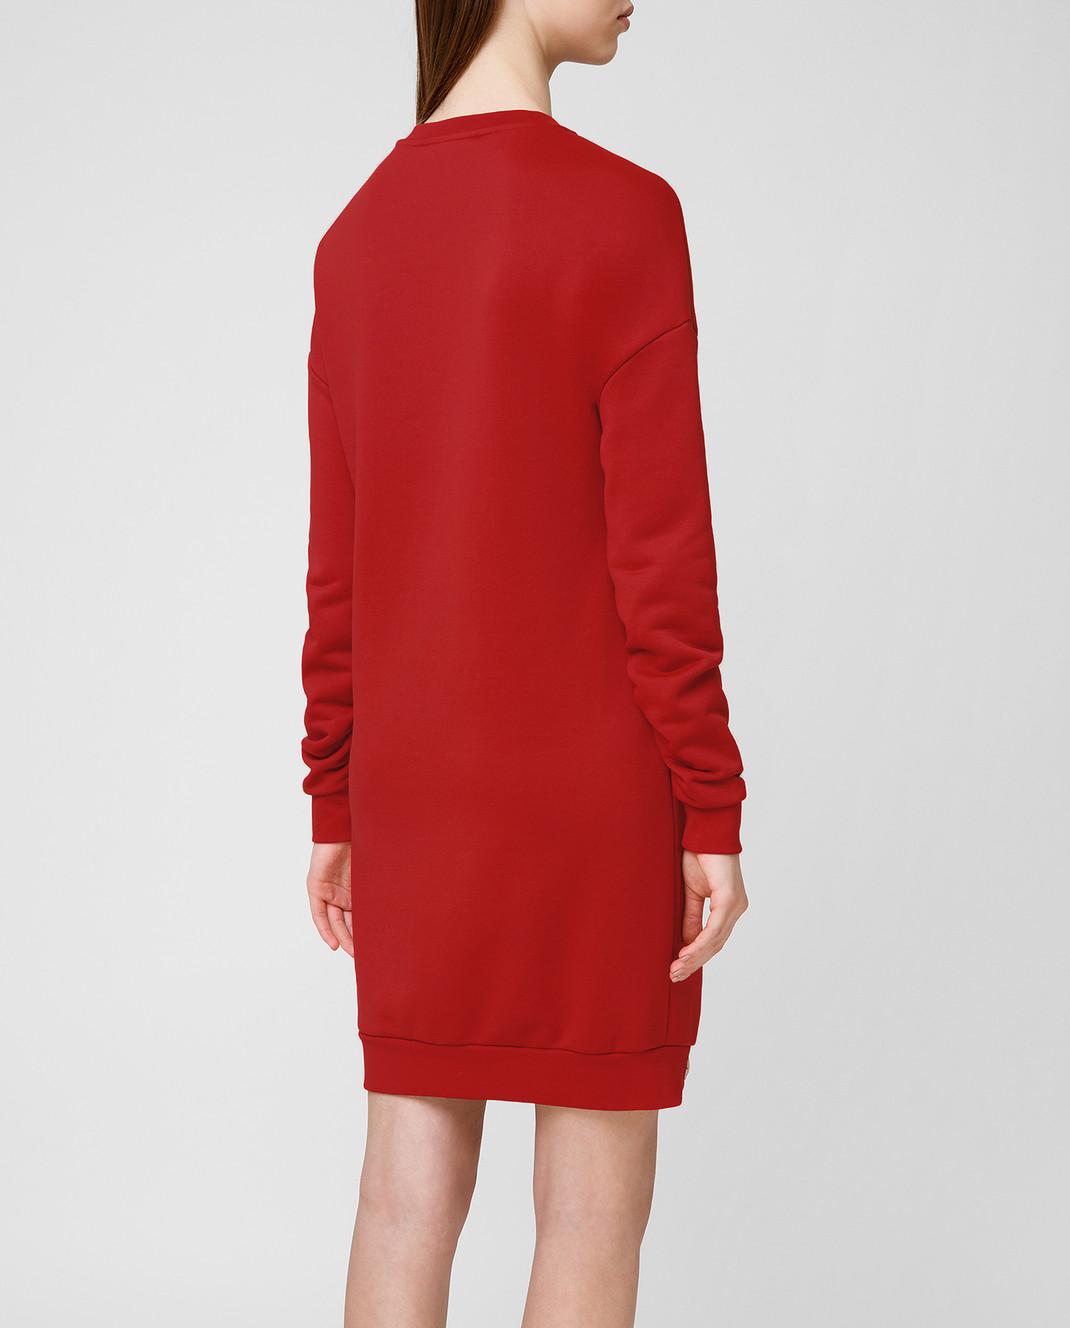 Philipp Plein Красное платье WJO0373 изображение 4